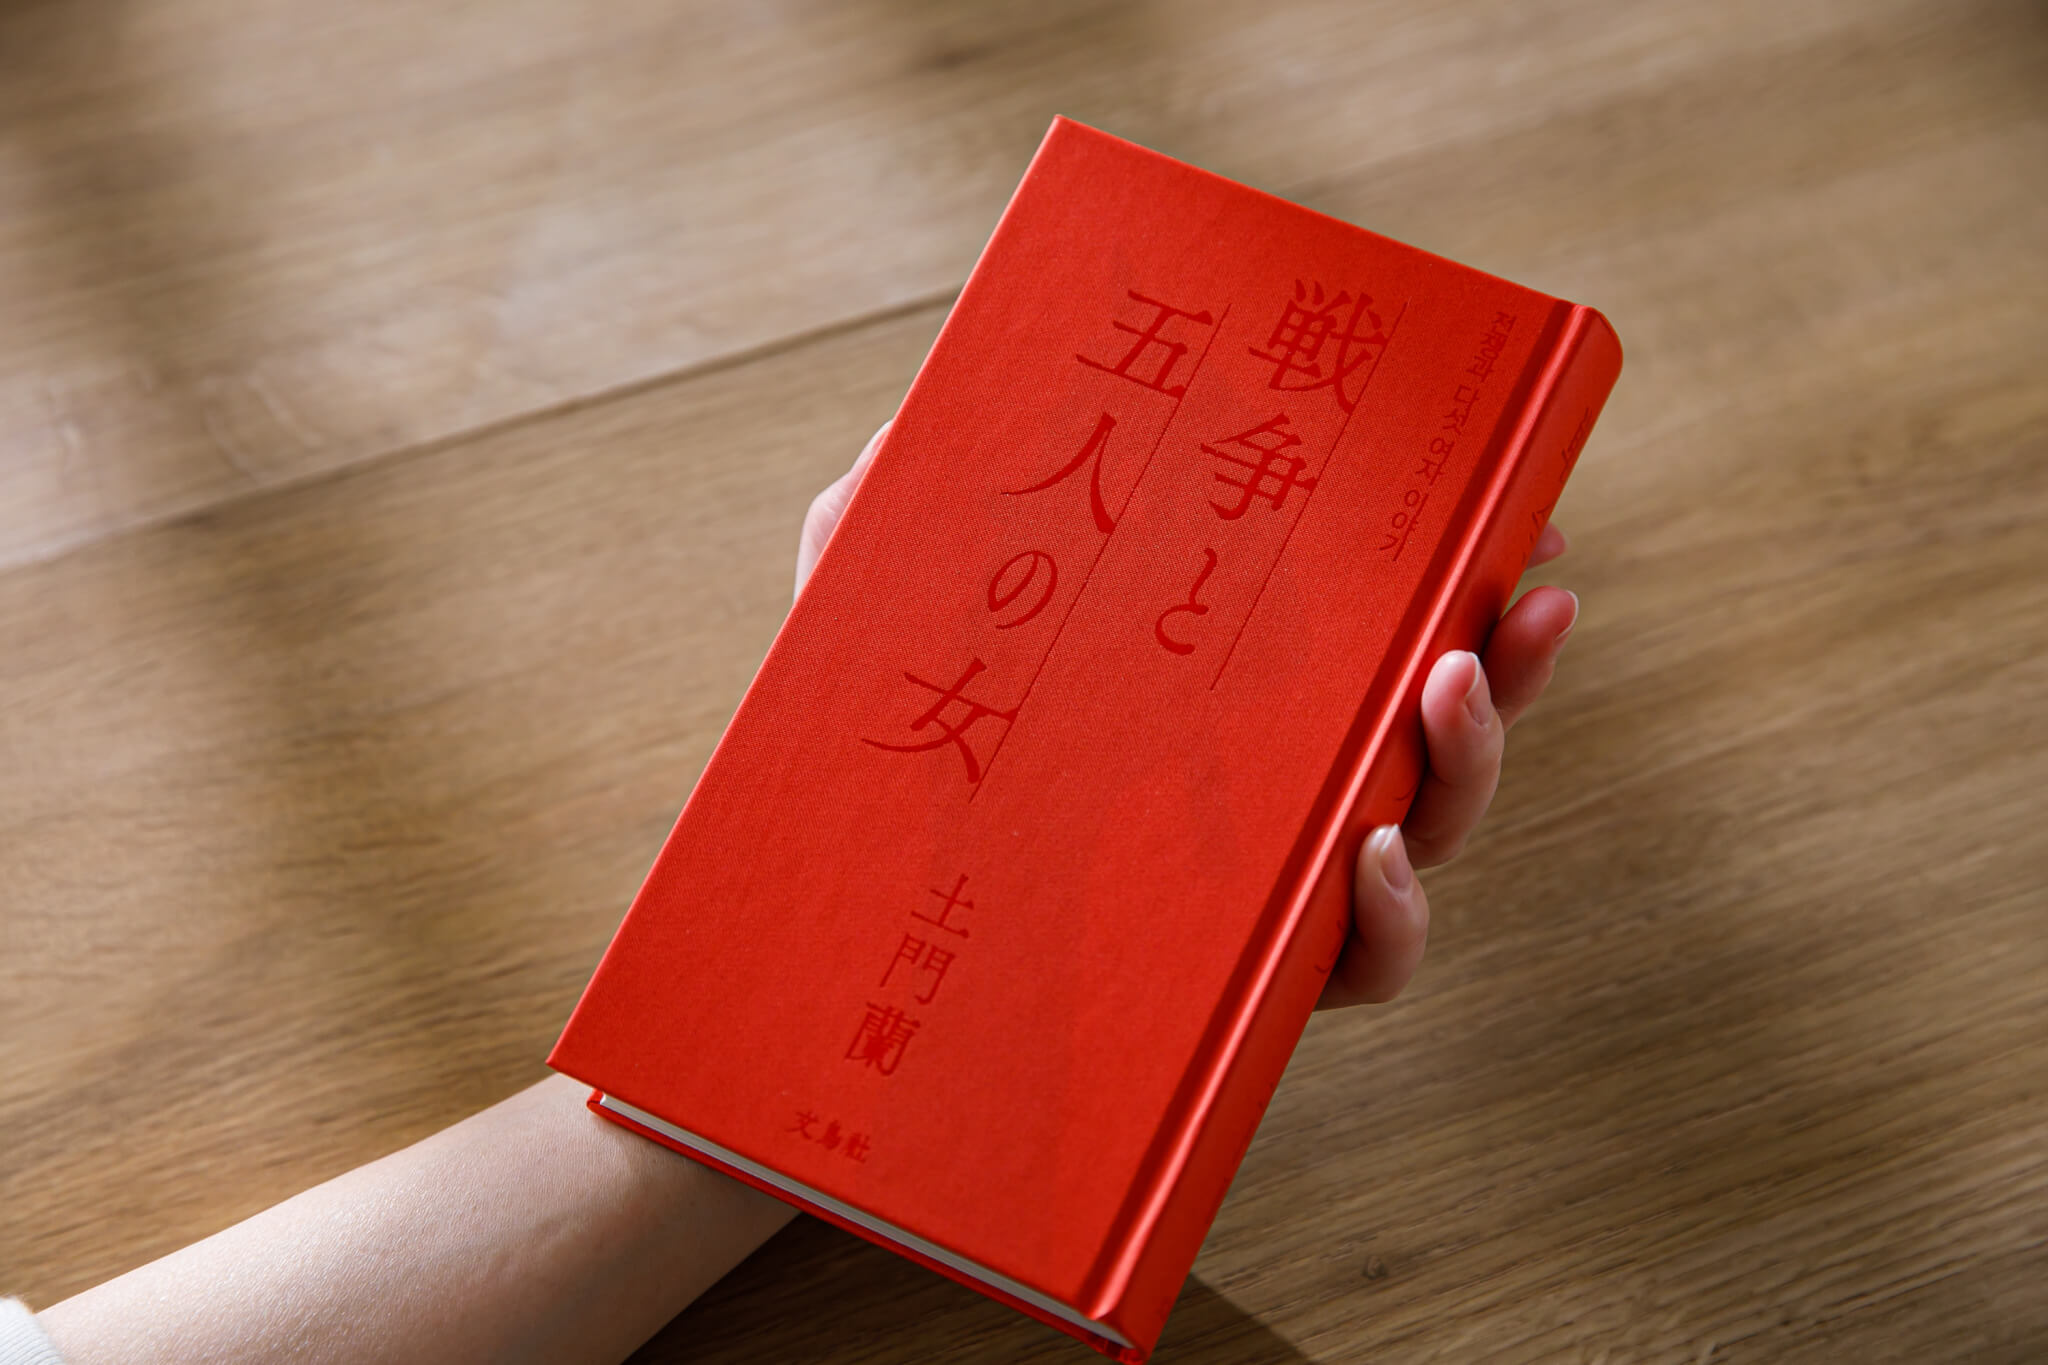 戦争と五人の女,京都文鳥社,土門蘭